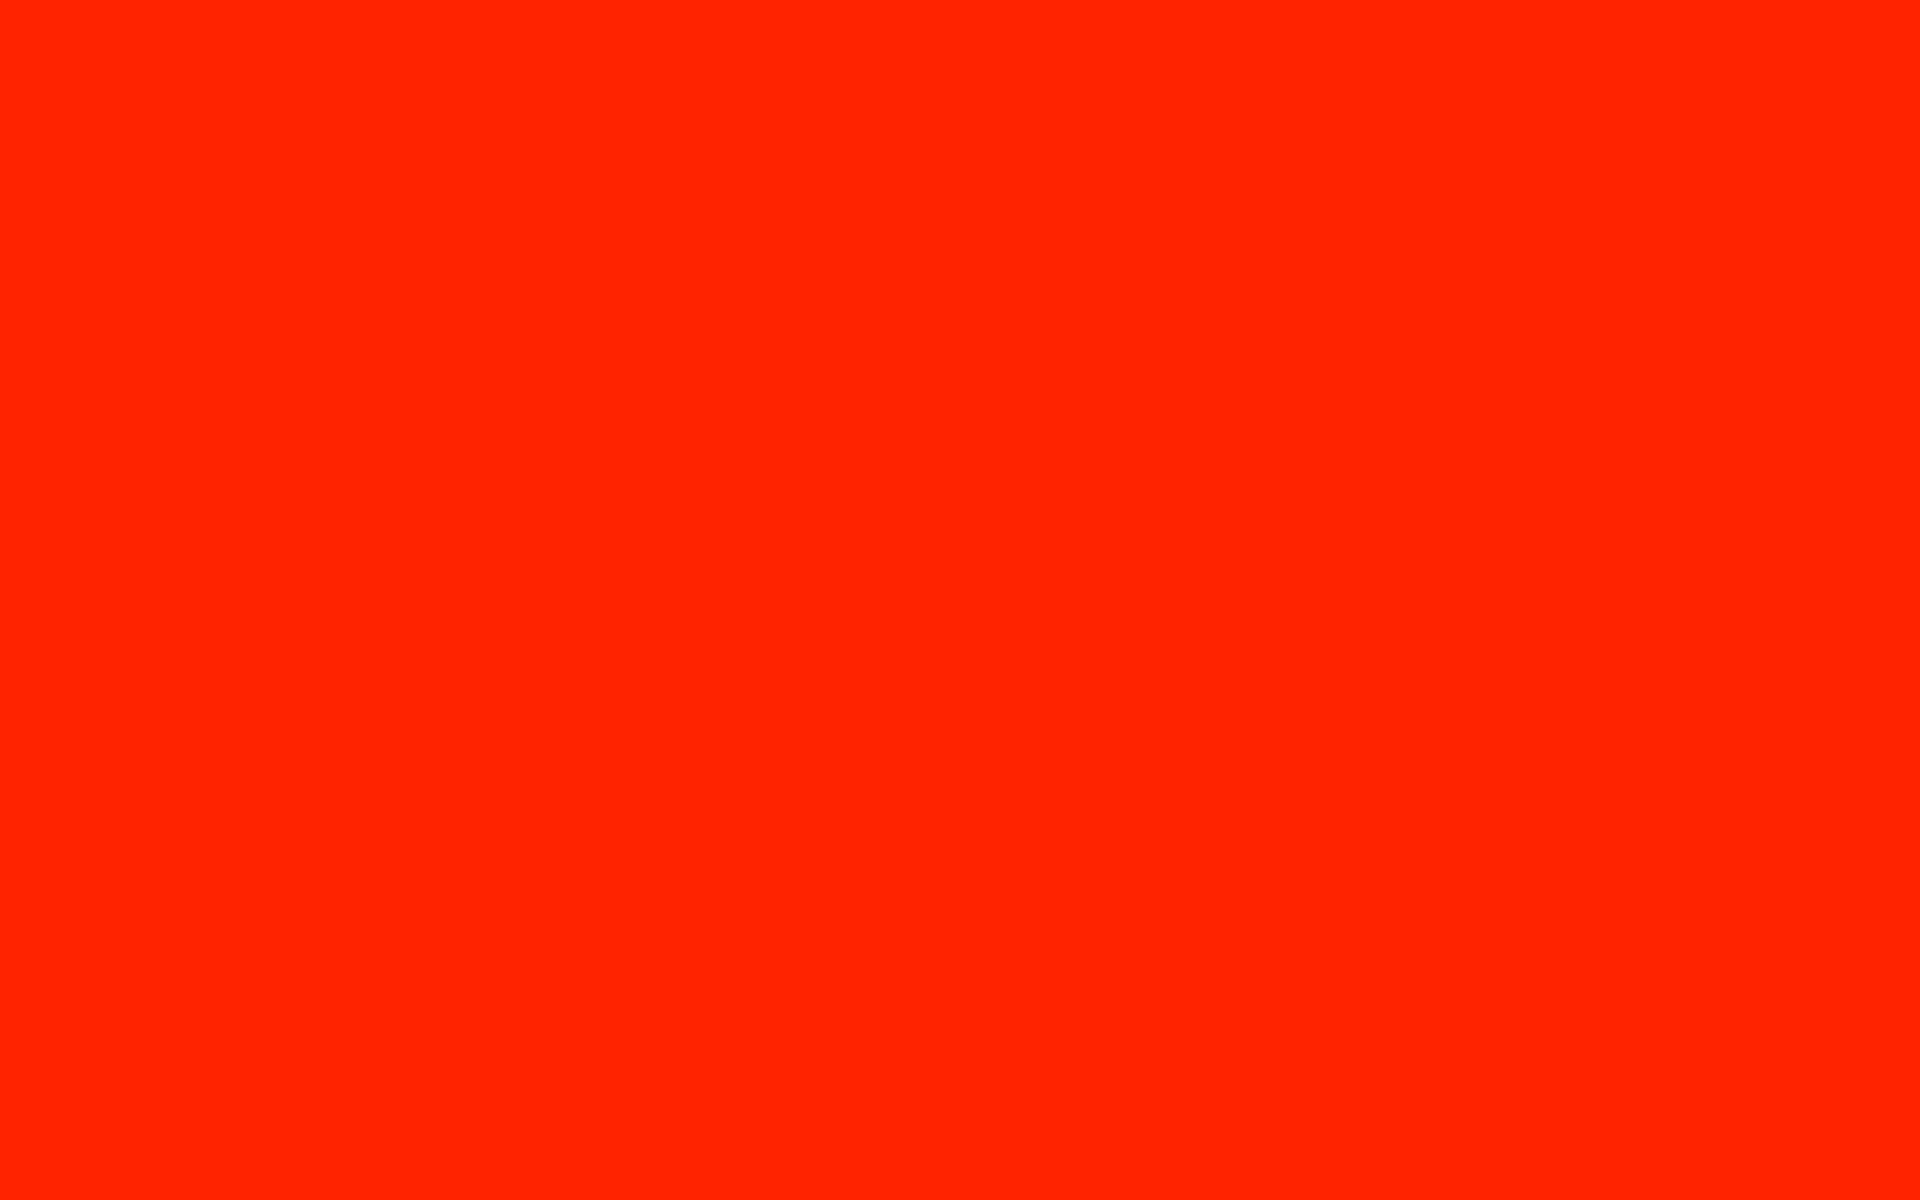 1920x1200 Scarlet Solid Color Background